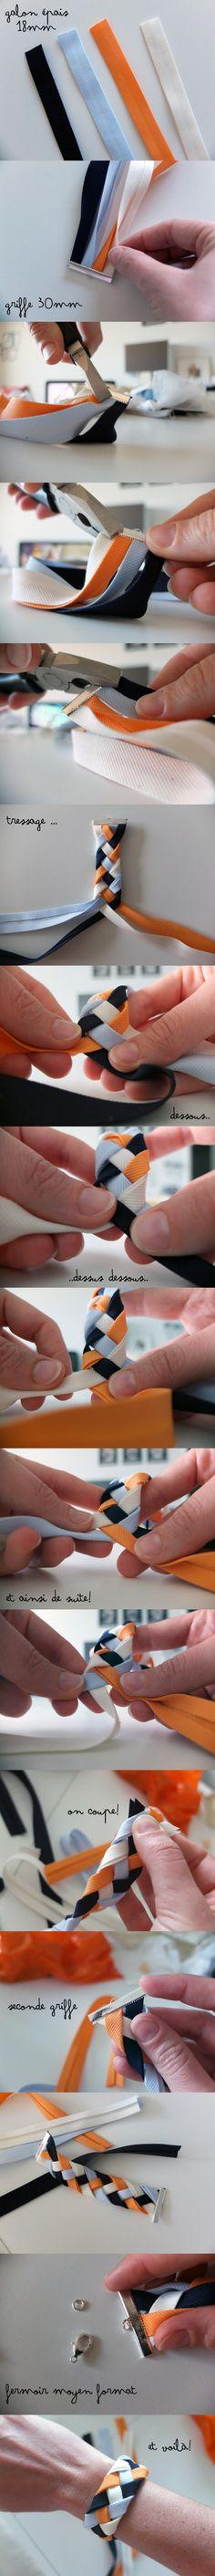 Homemade Navy Bangles °° Tuto Bracelet Tressé °° www.kutchetcouture.com